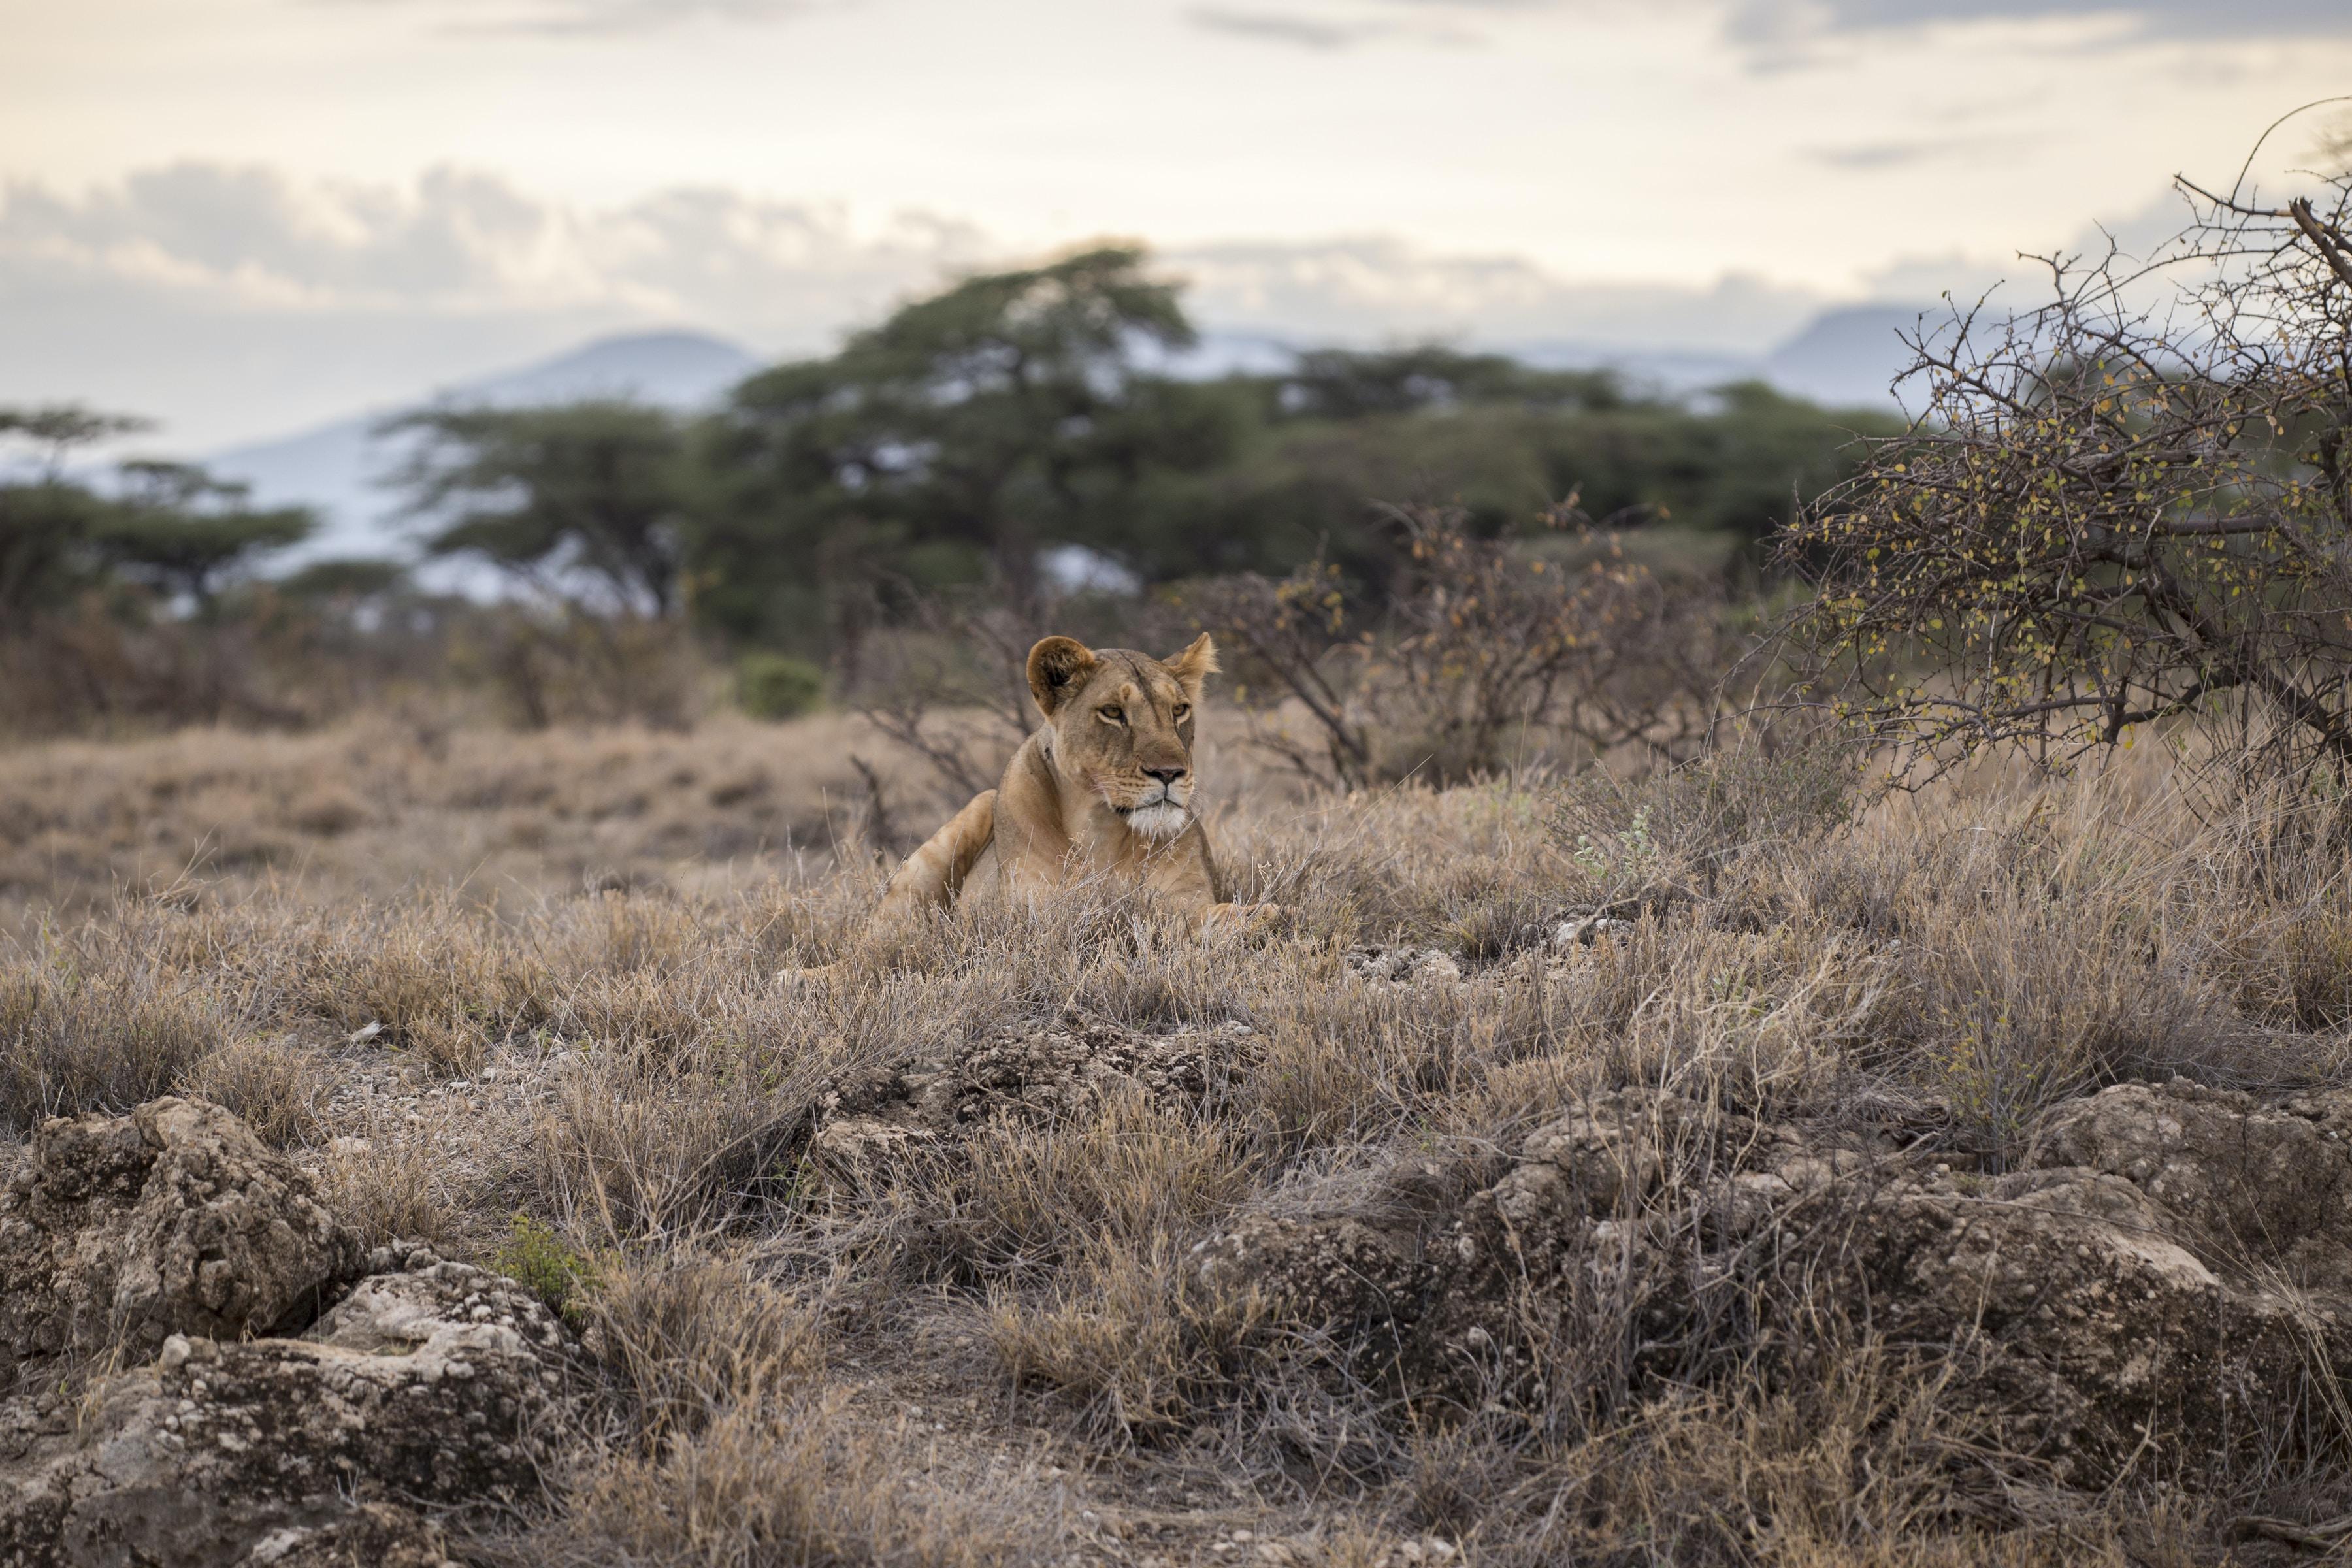 African safari savanna grassland landscape with trees and female lion